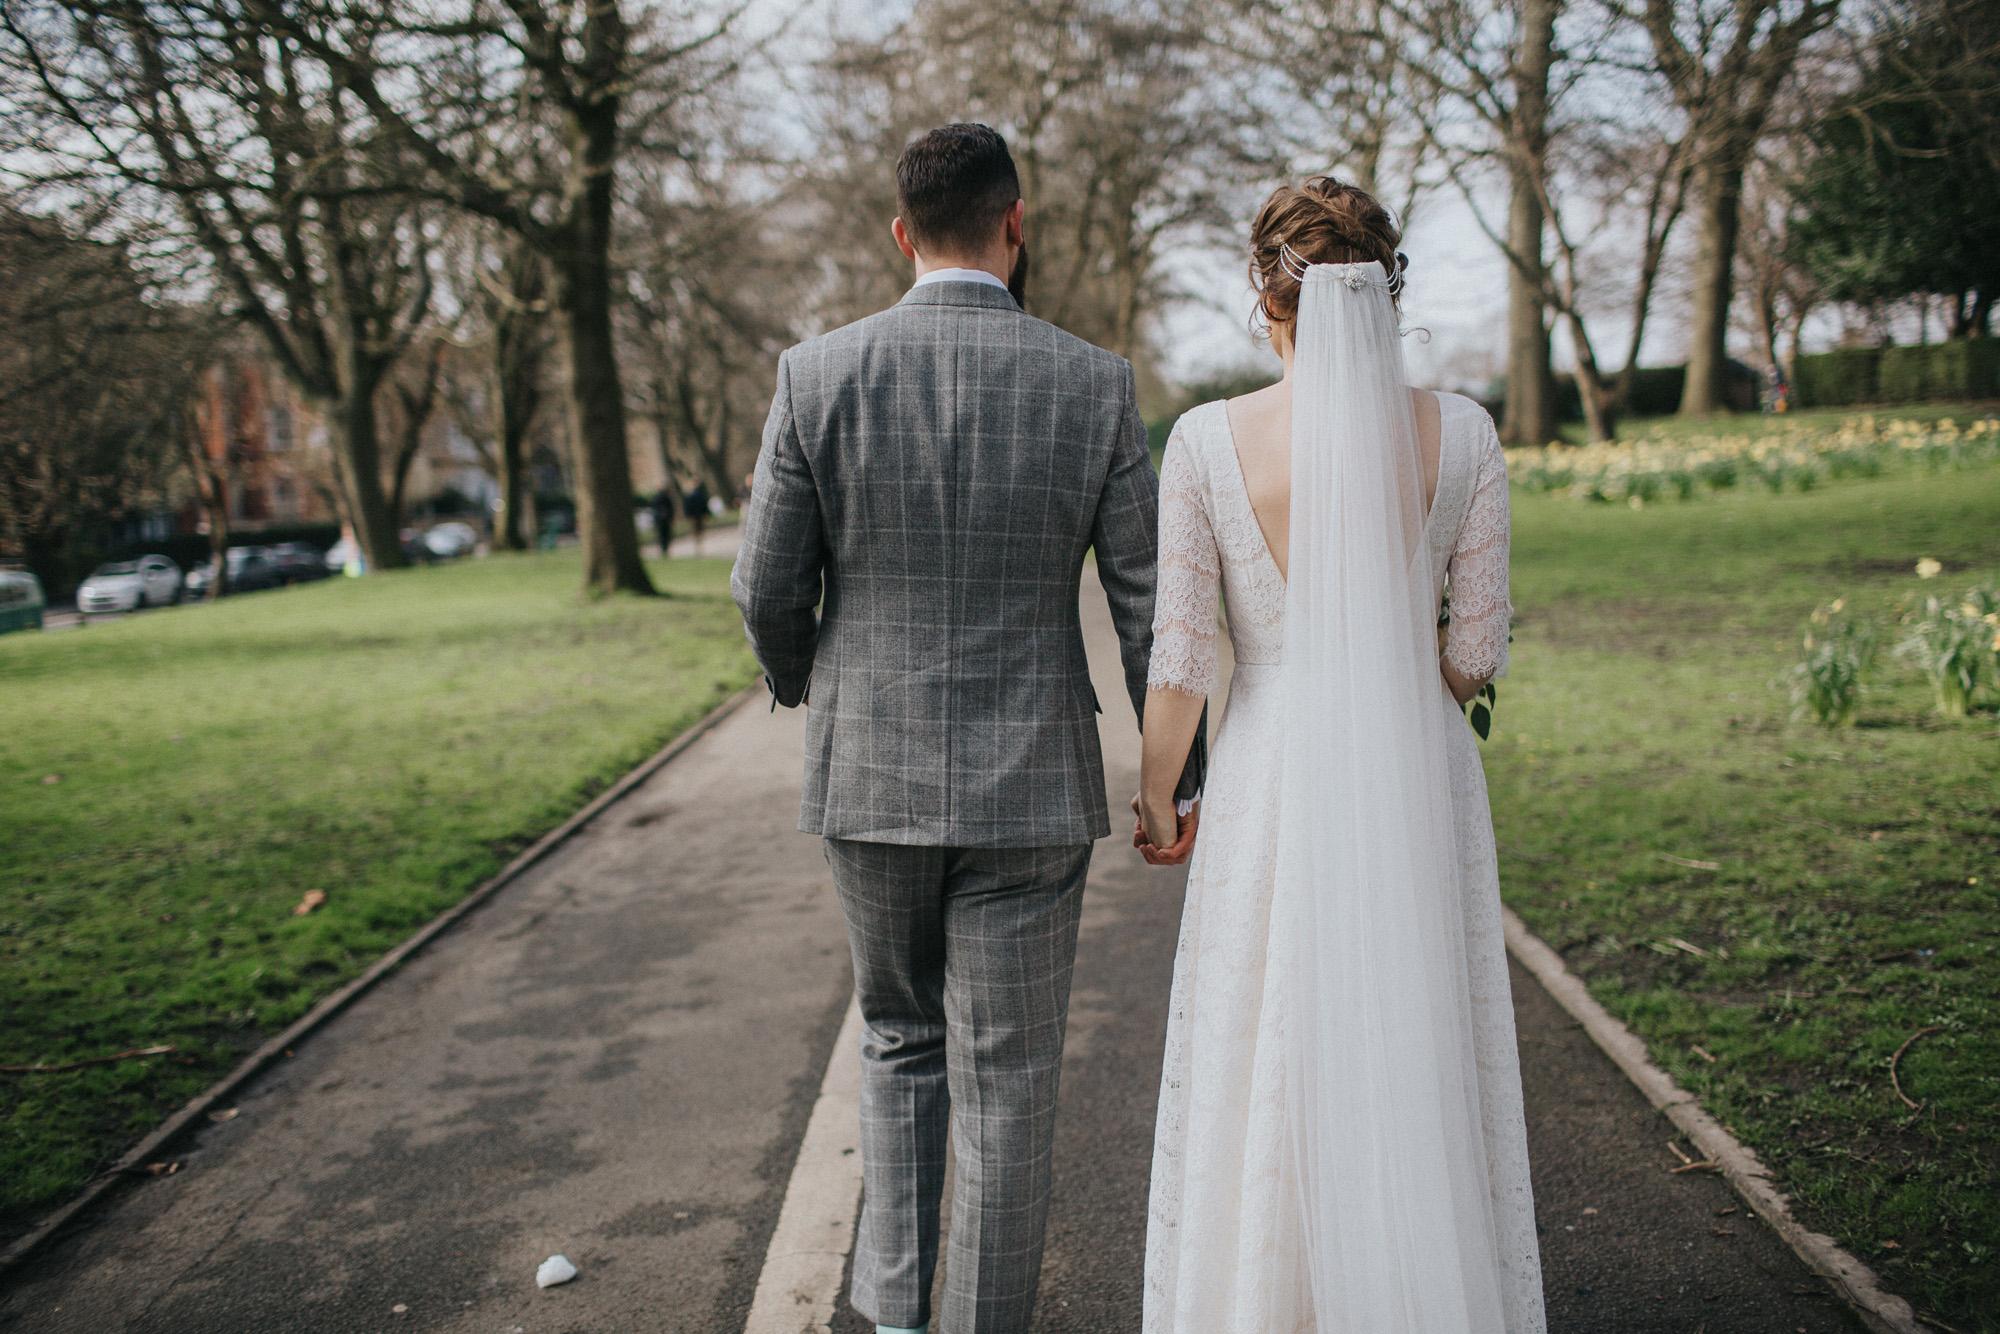 Kate-Beaumont-Lace-Flared-Dahlia-Gown-Leeds-Wedding-Bloom-Weddings-35.jpg